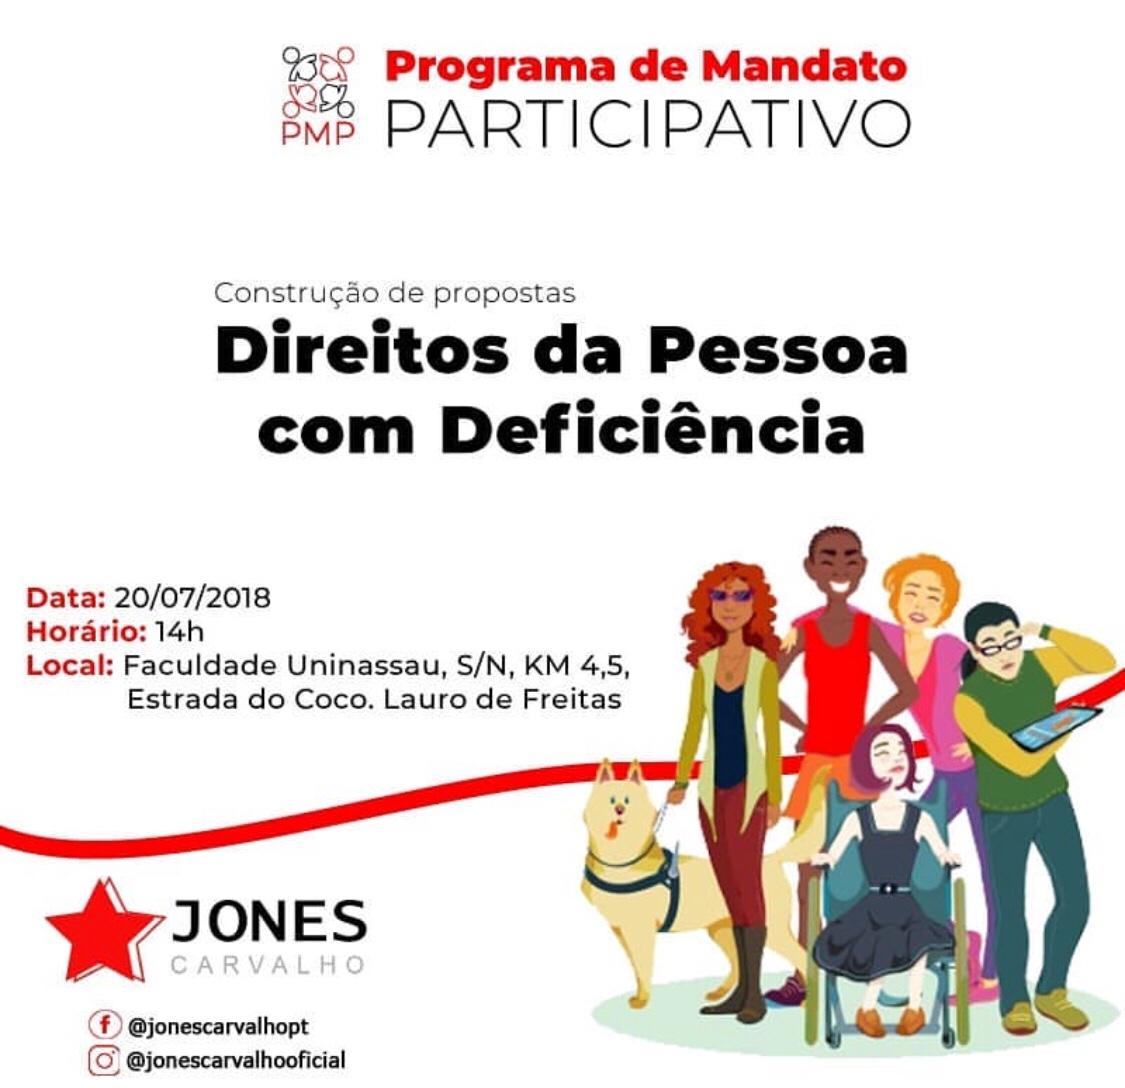 Jones Carvalho inicia Programa de Mandato Participativo. Participe!